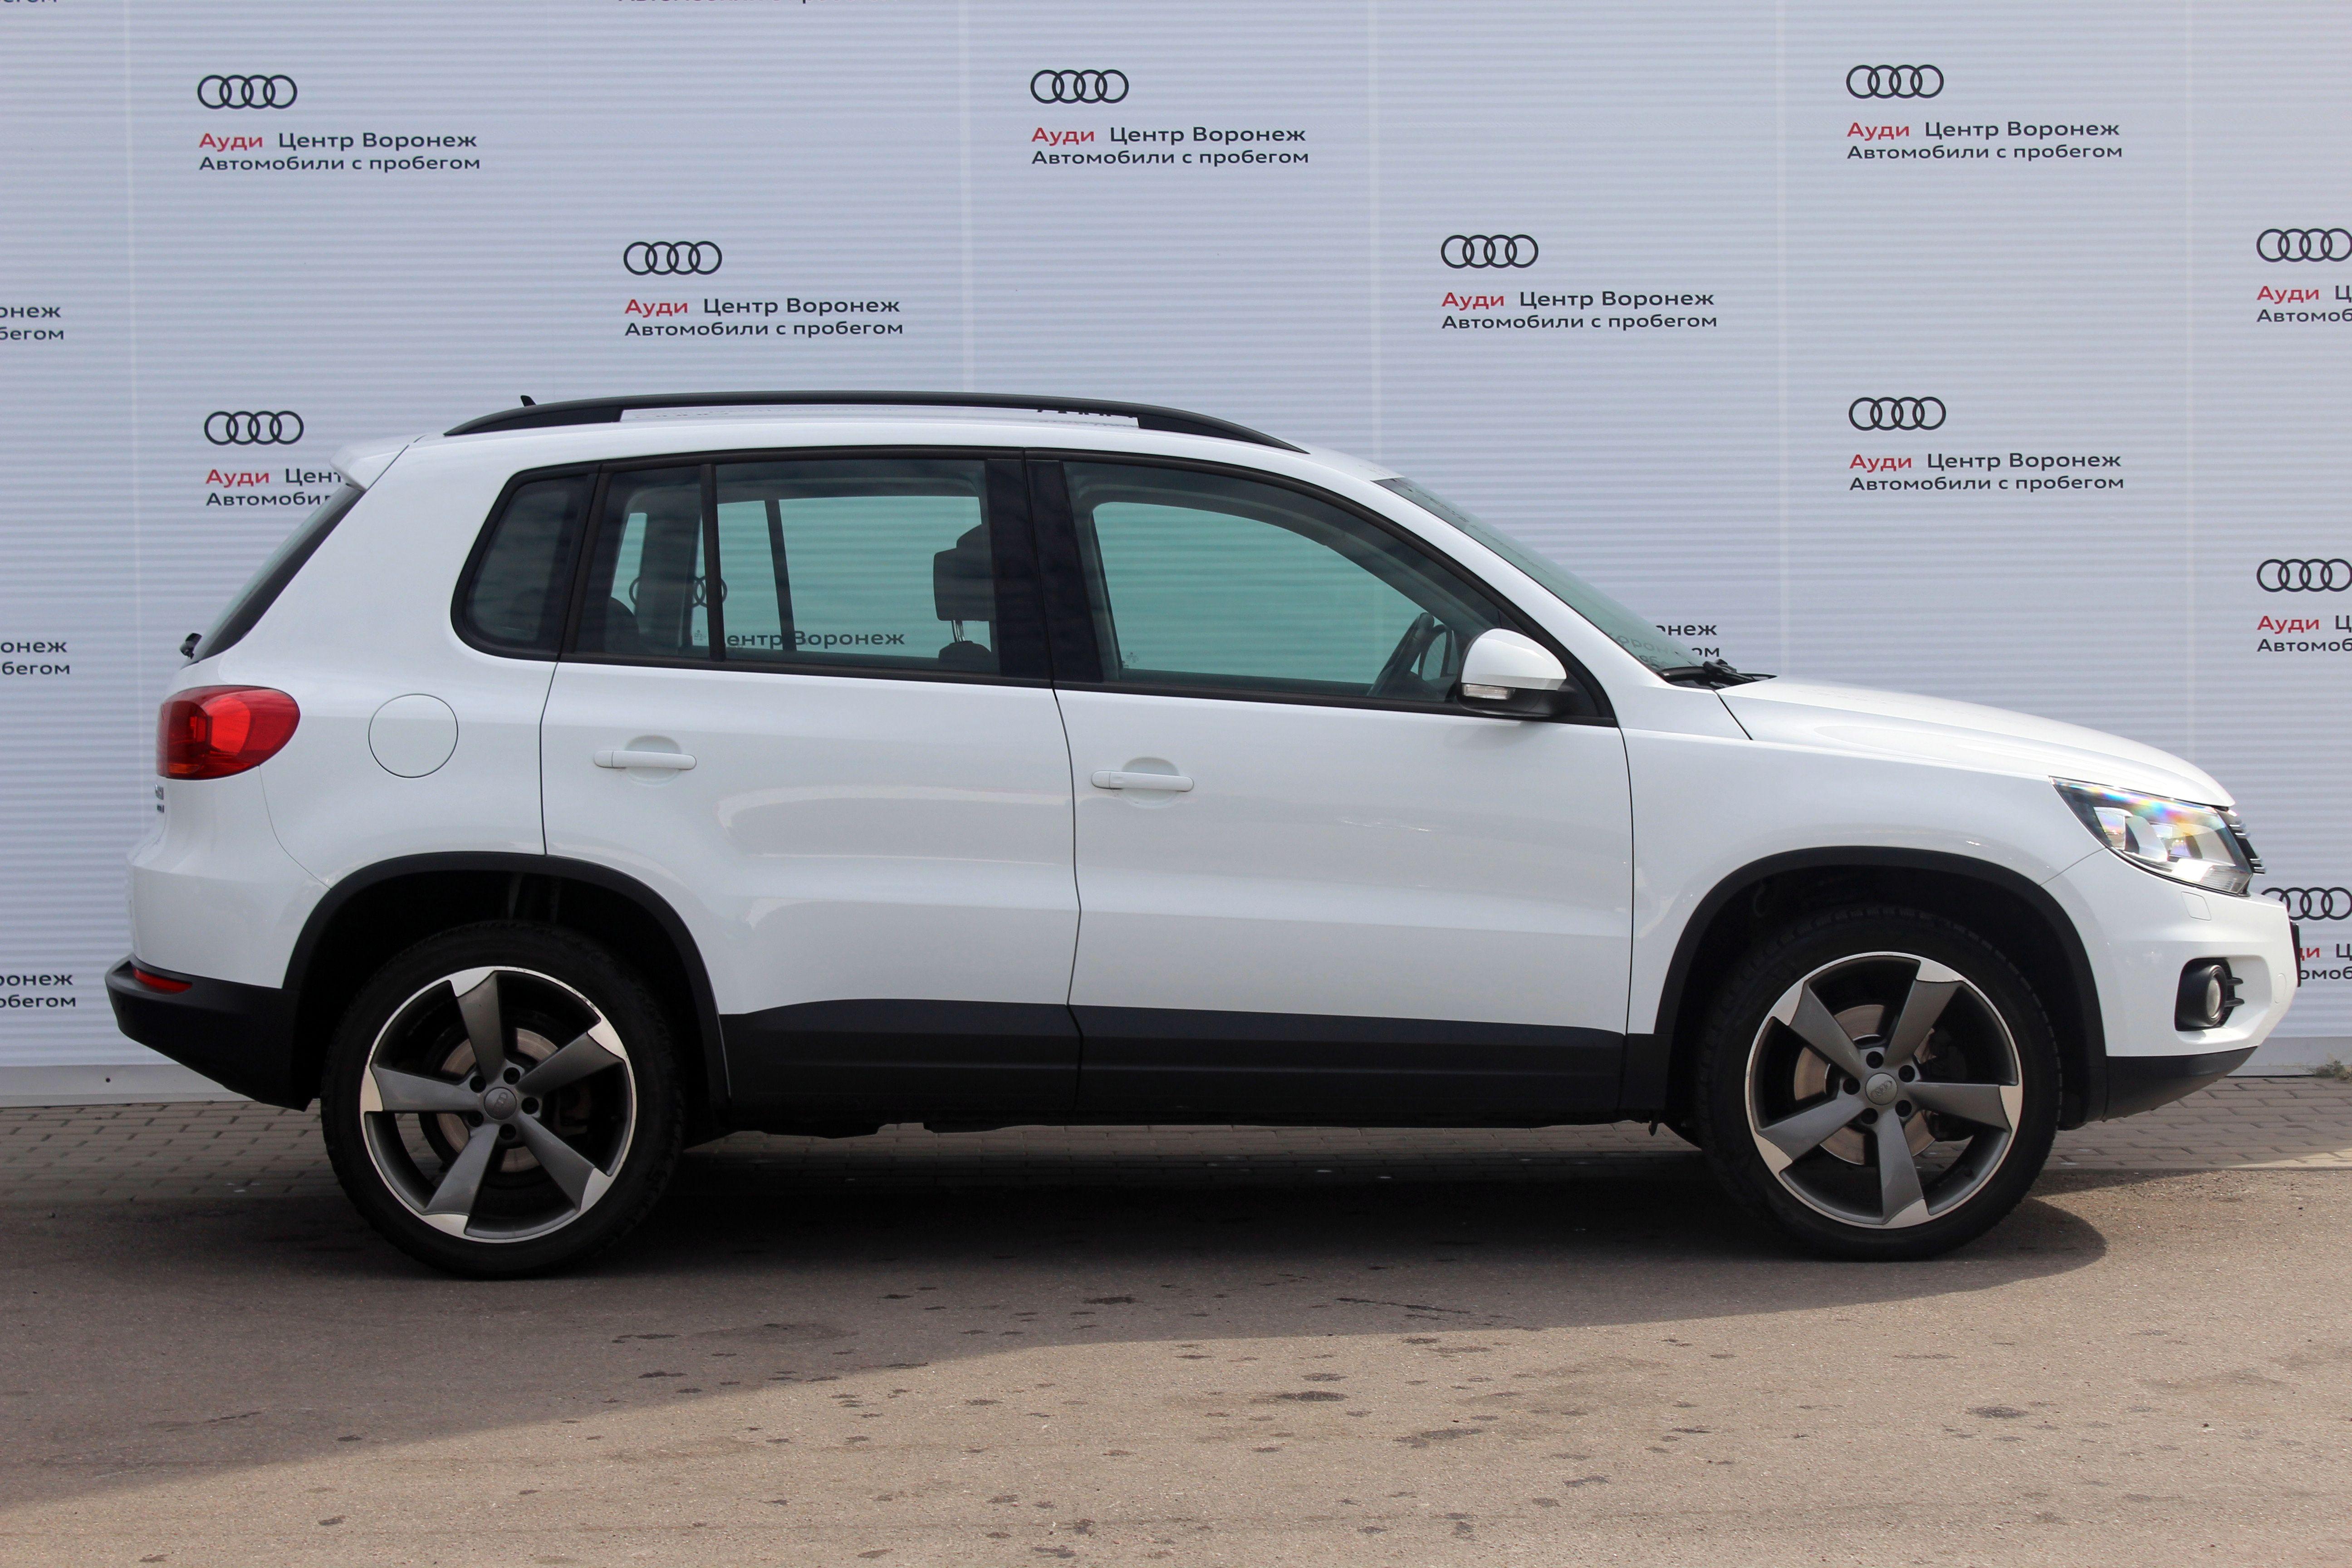 Volkswagen Tiguan Внедорожник (2014г.)